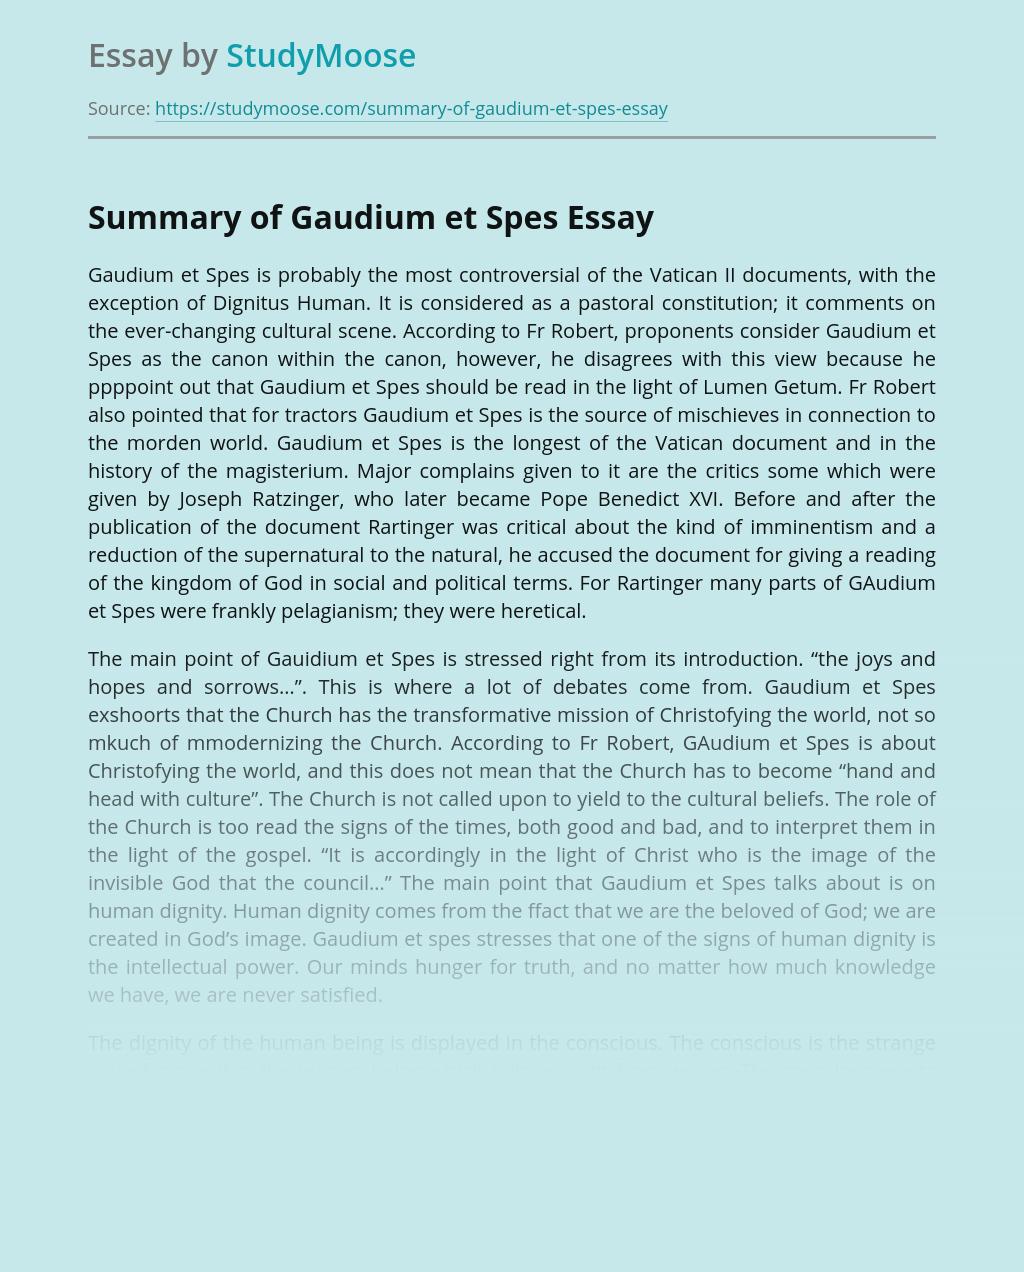 Summary of Church's Gaudium et Spes